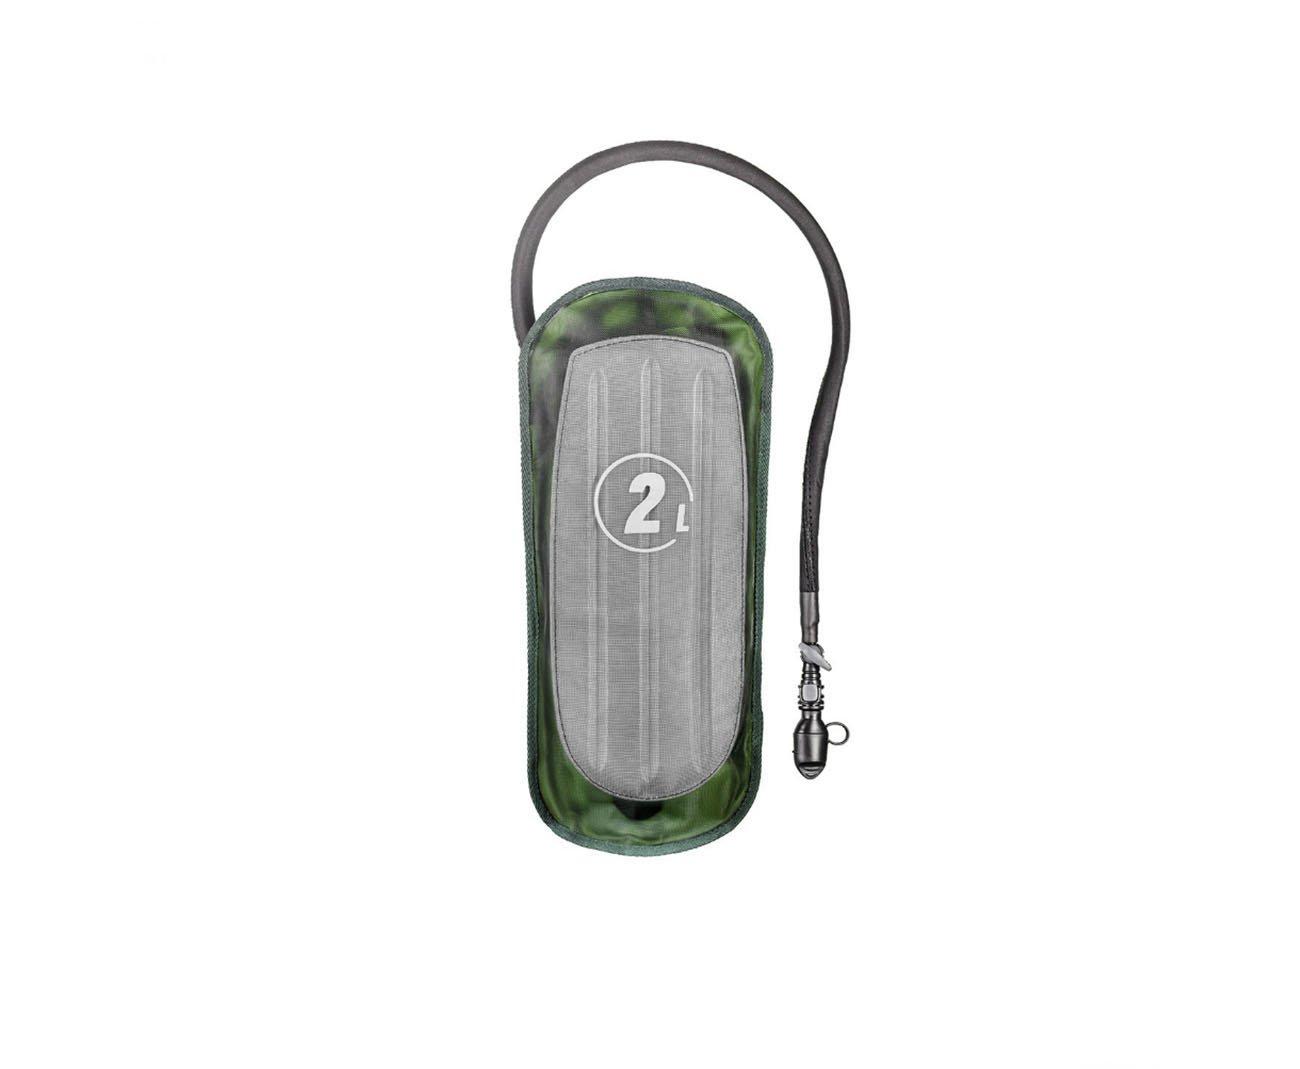 Refil De Hidratação Viper Verde Oliva 2l - Invictus